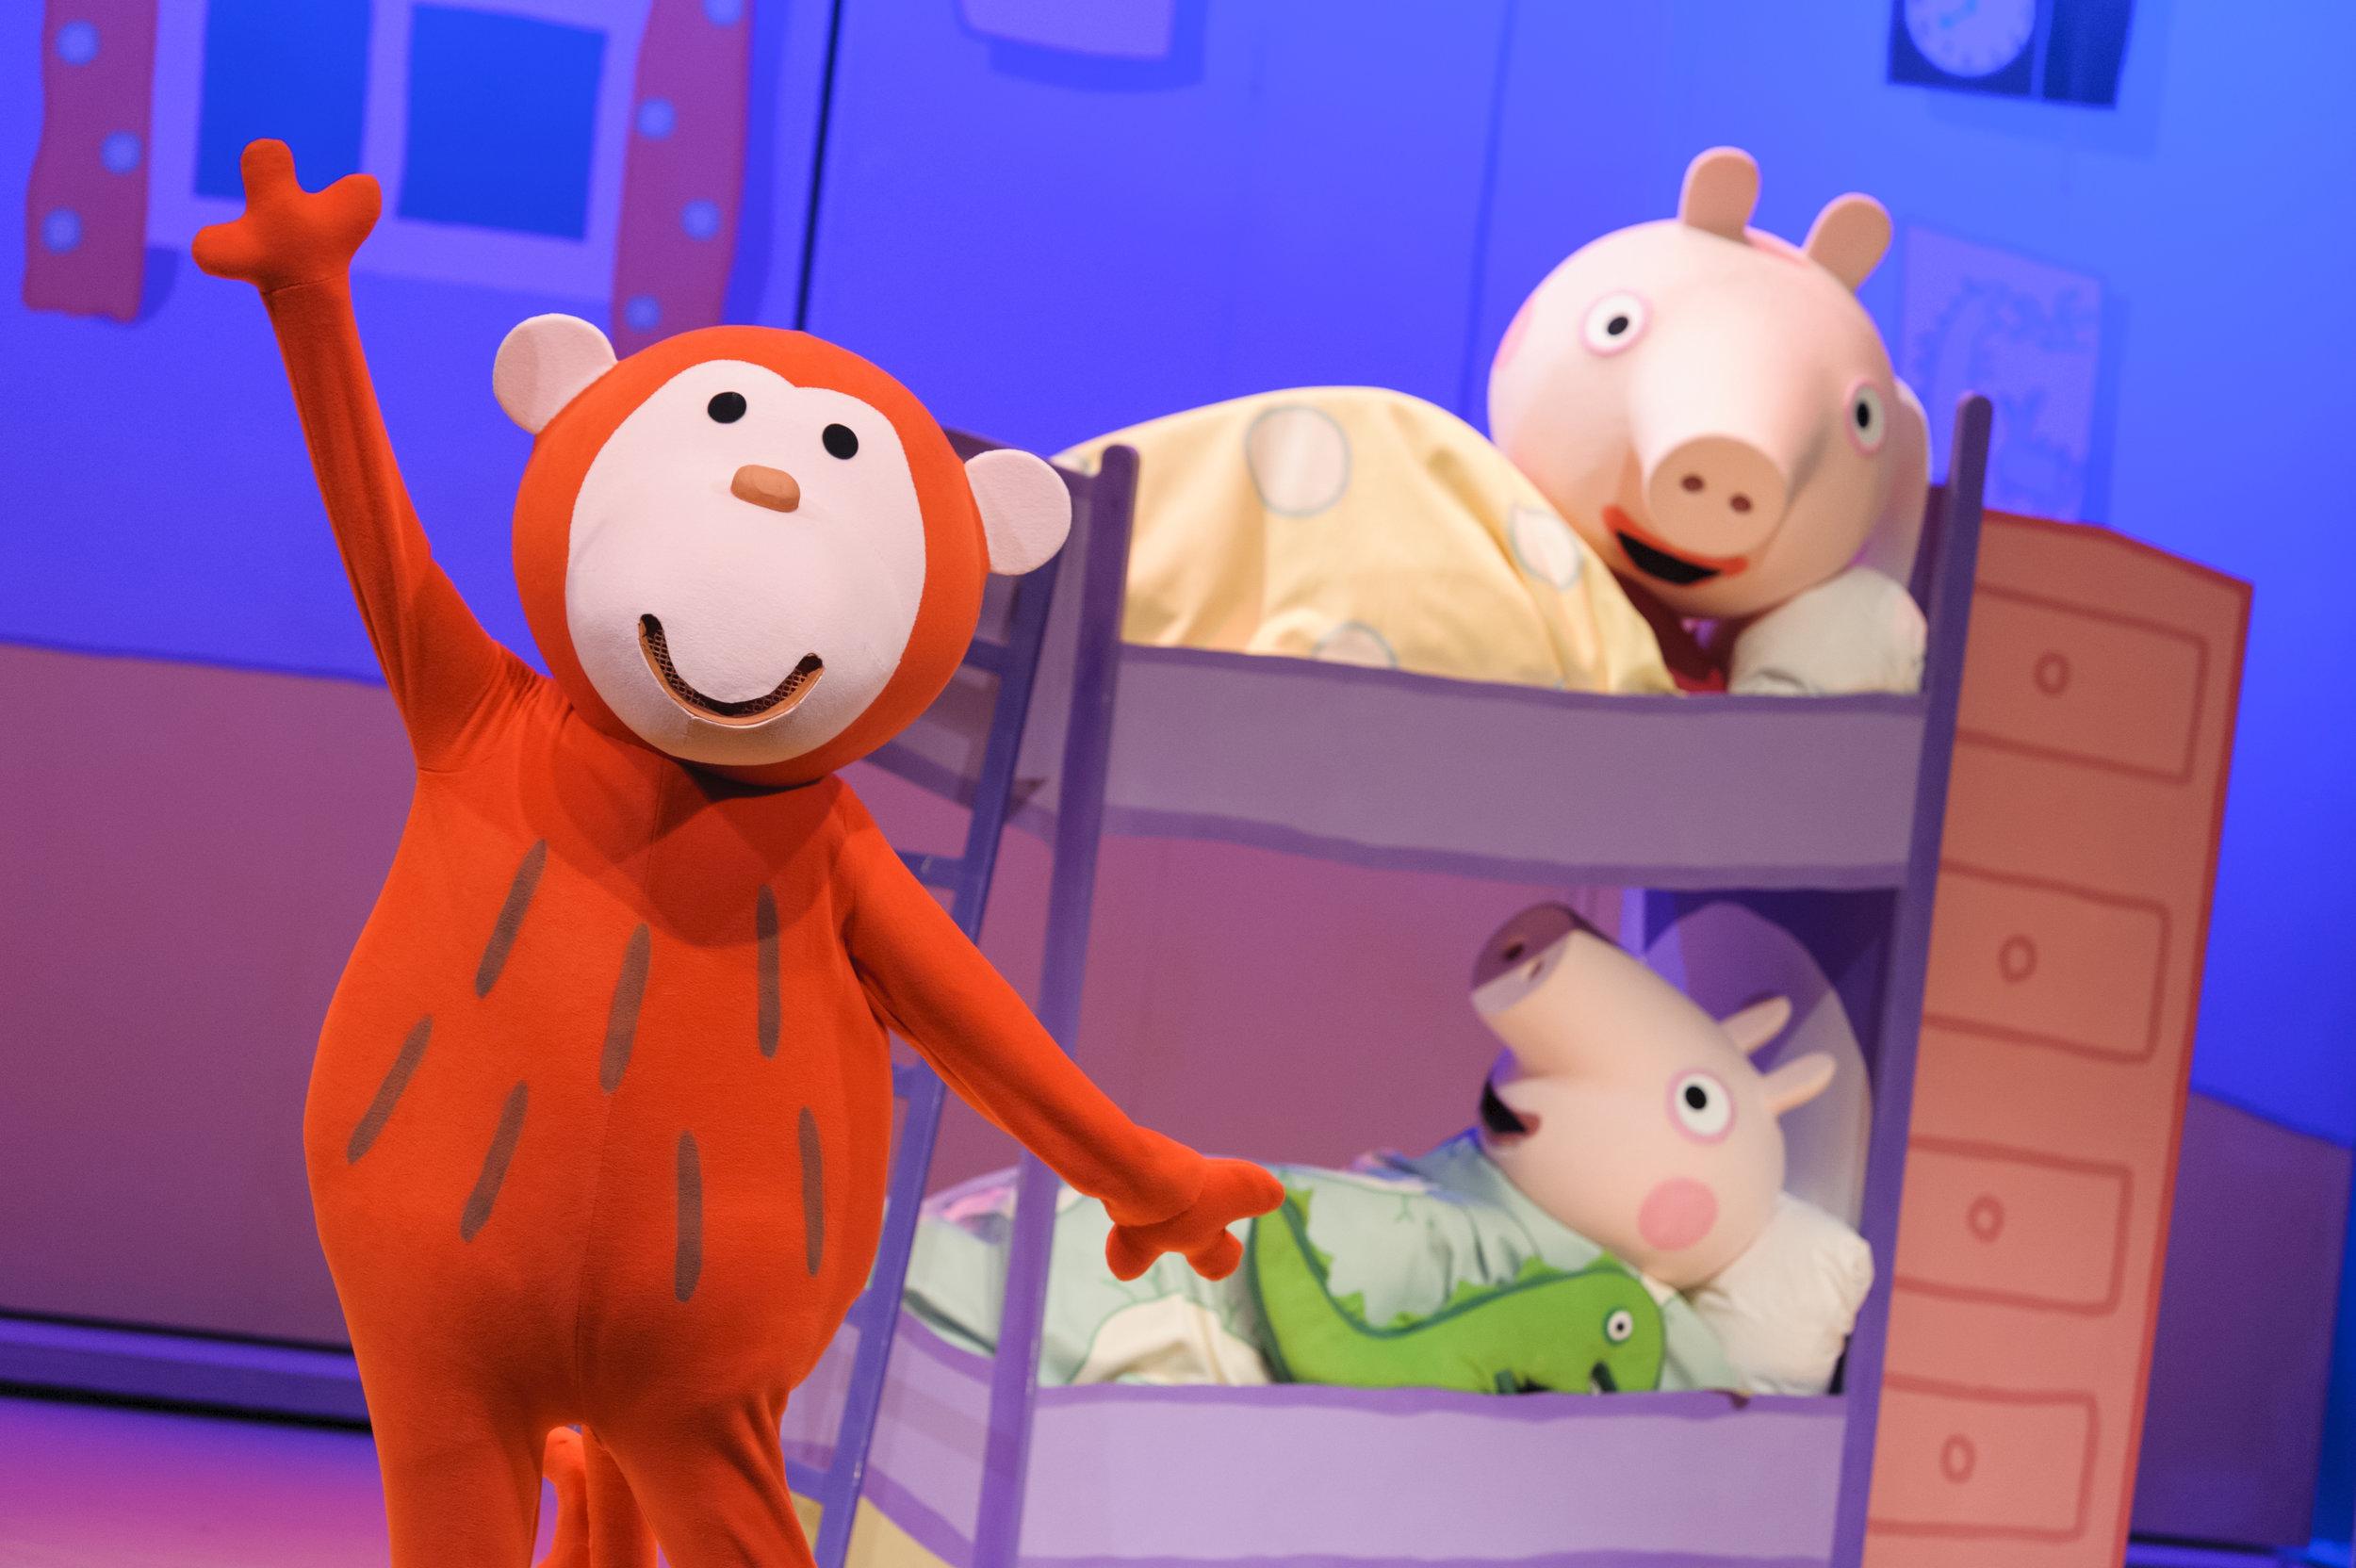 Red Monkey, Peppa Pig and George